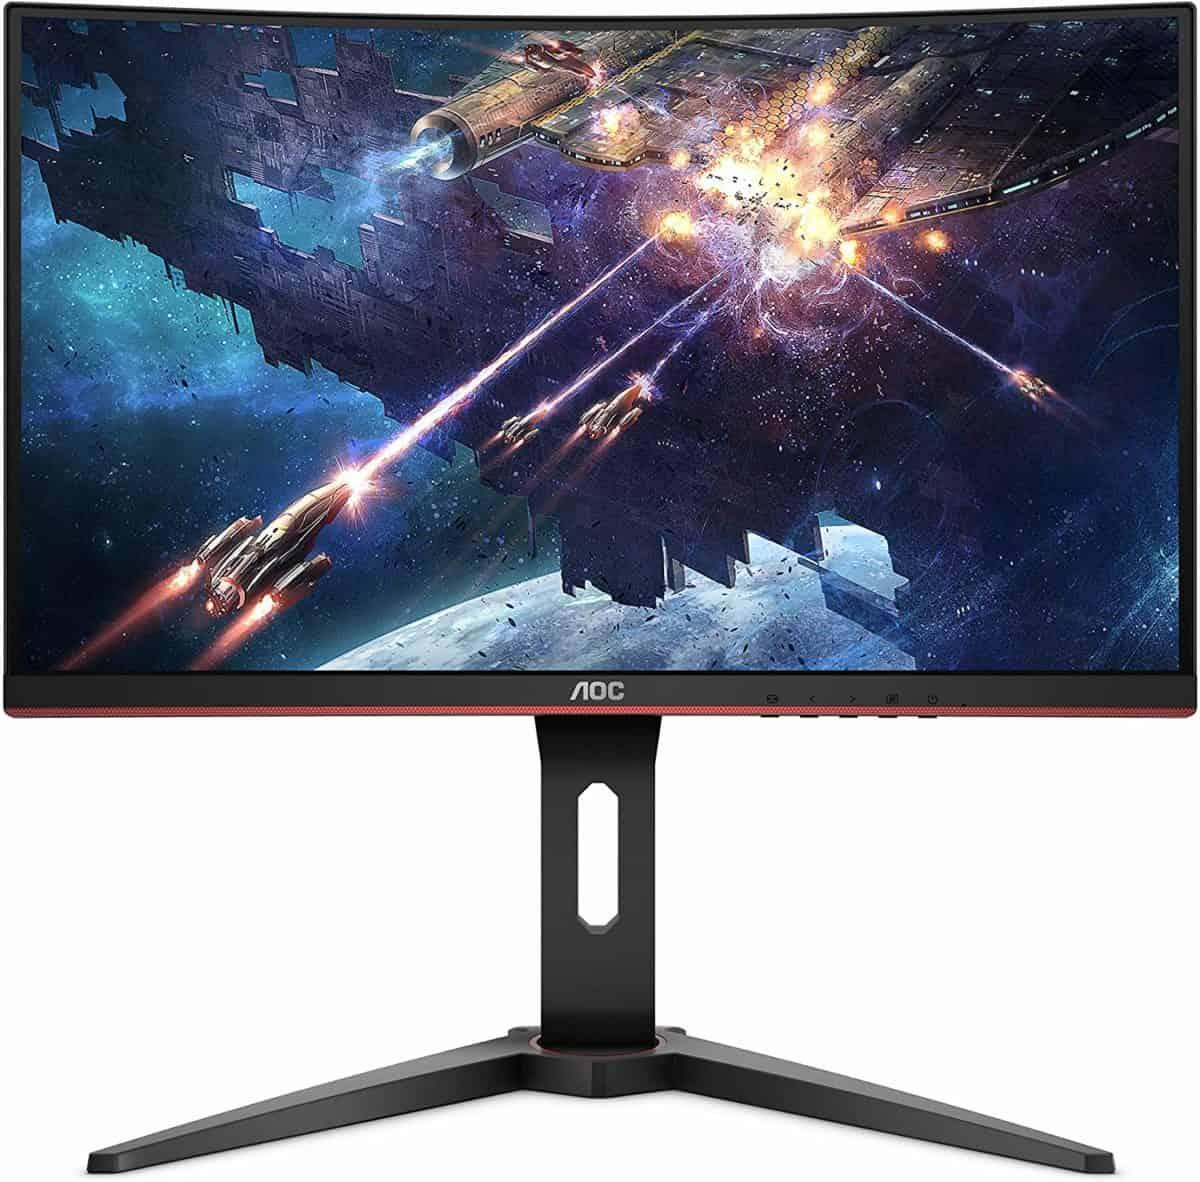 AOC C24G1 24″ Curved Frameless Gaming Monitor